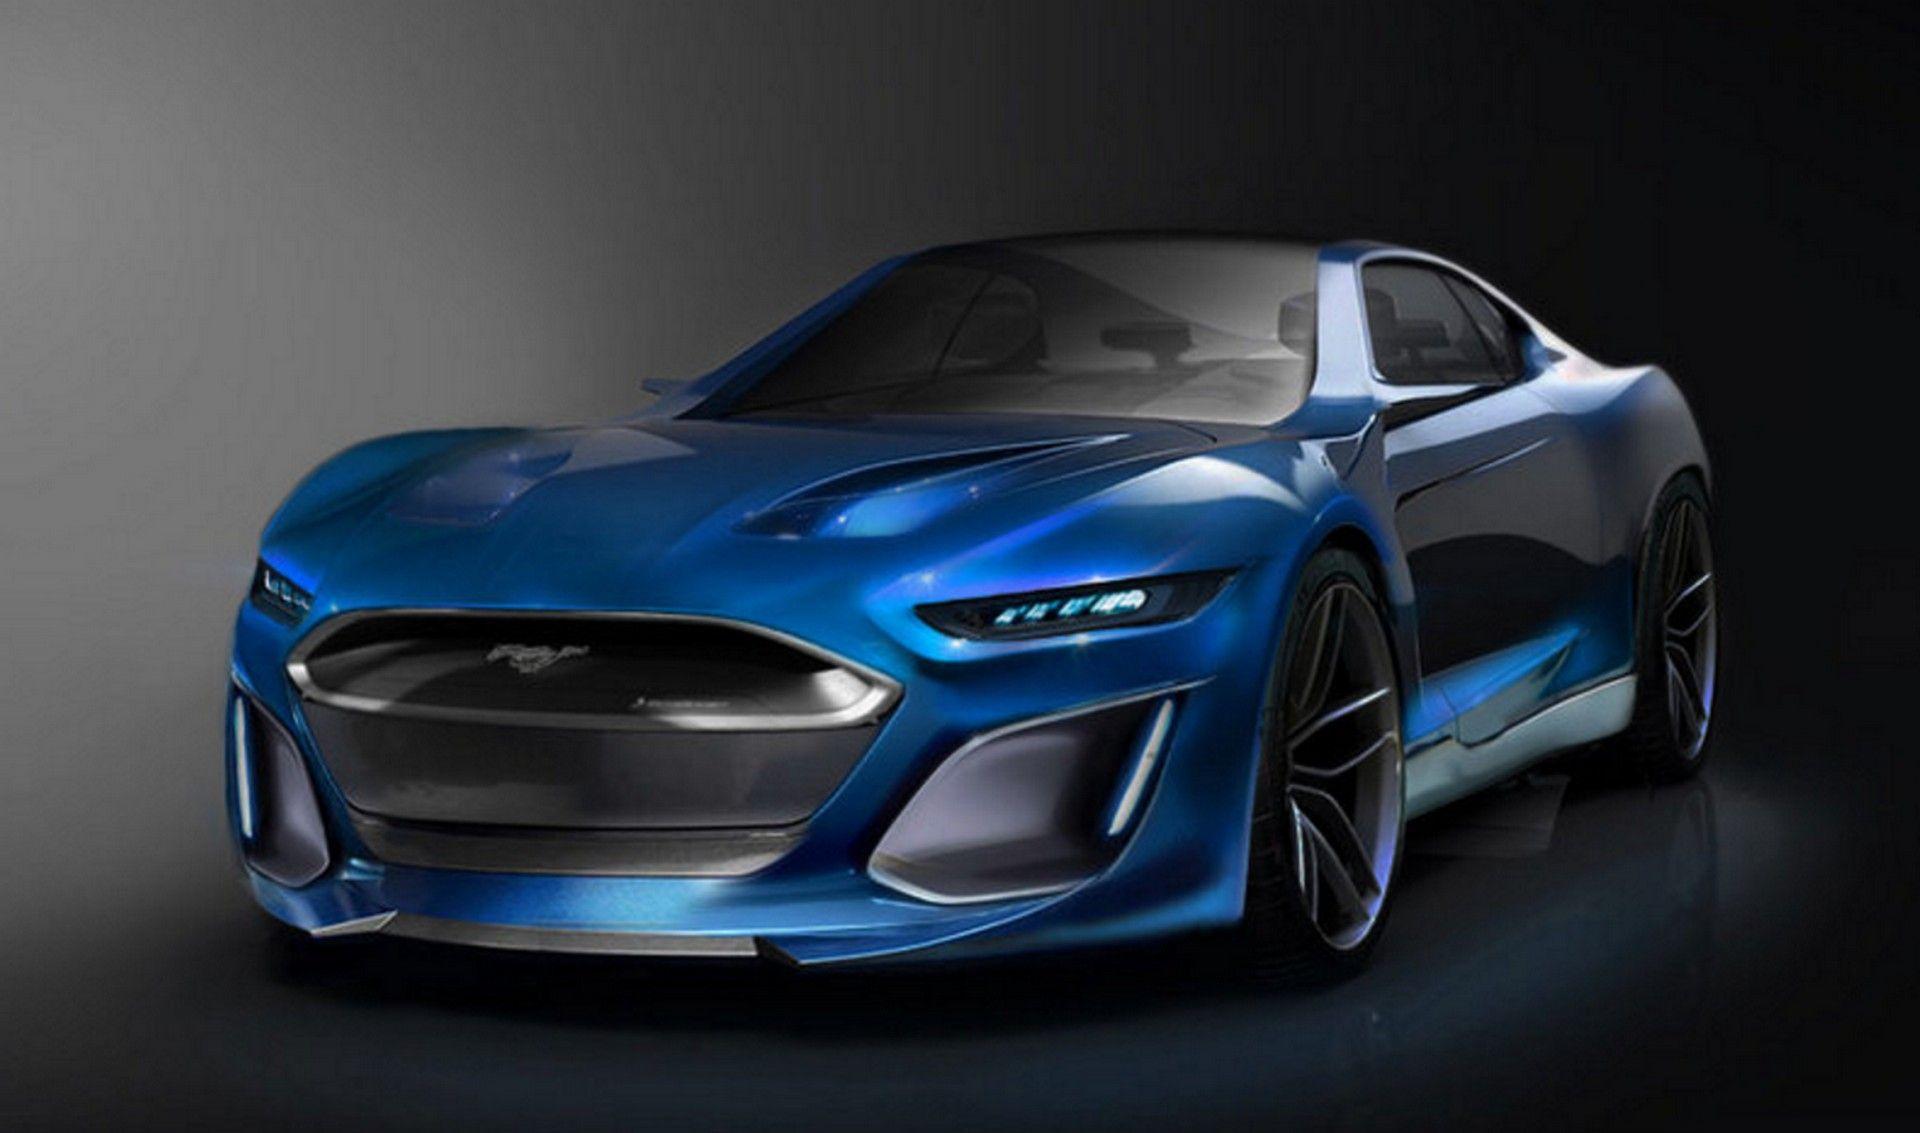 2021 Ford Mustang Concept | Ford Mustang, Ford Mustang Gt